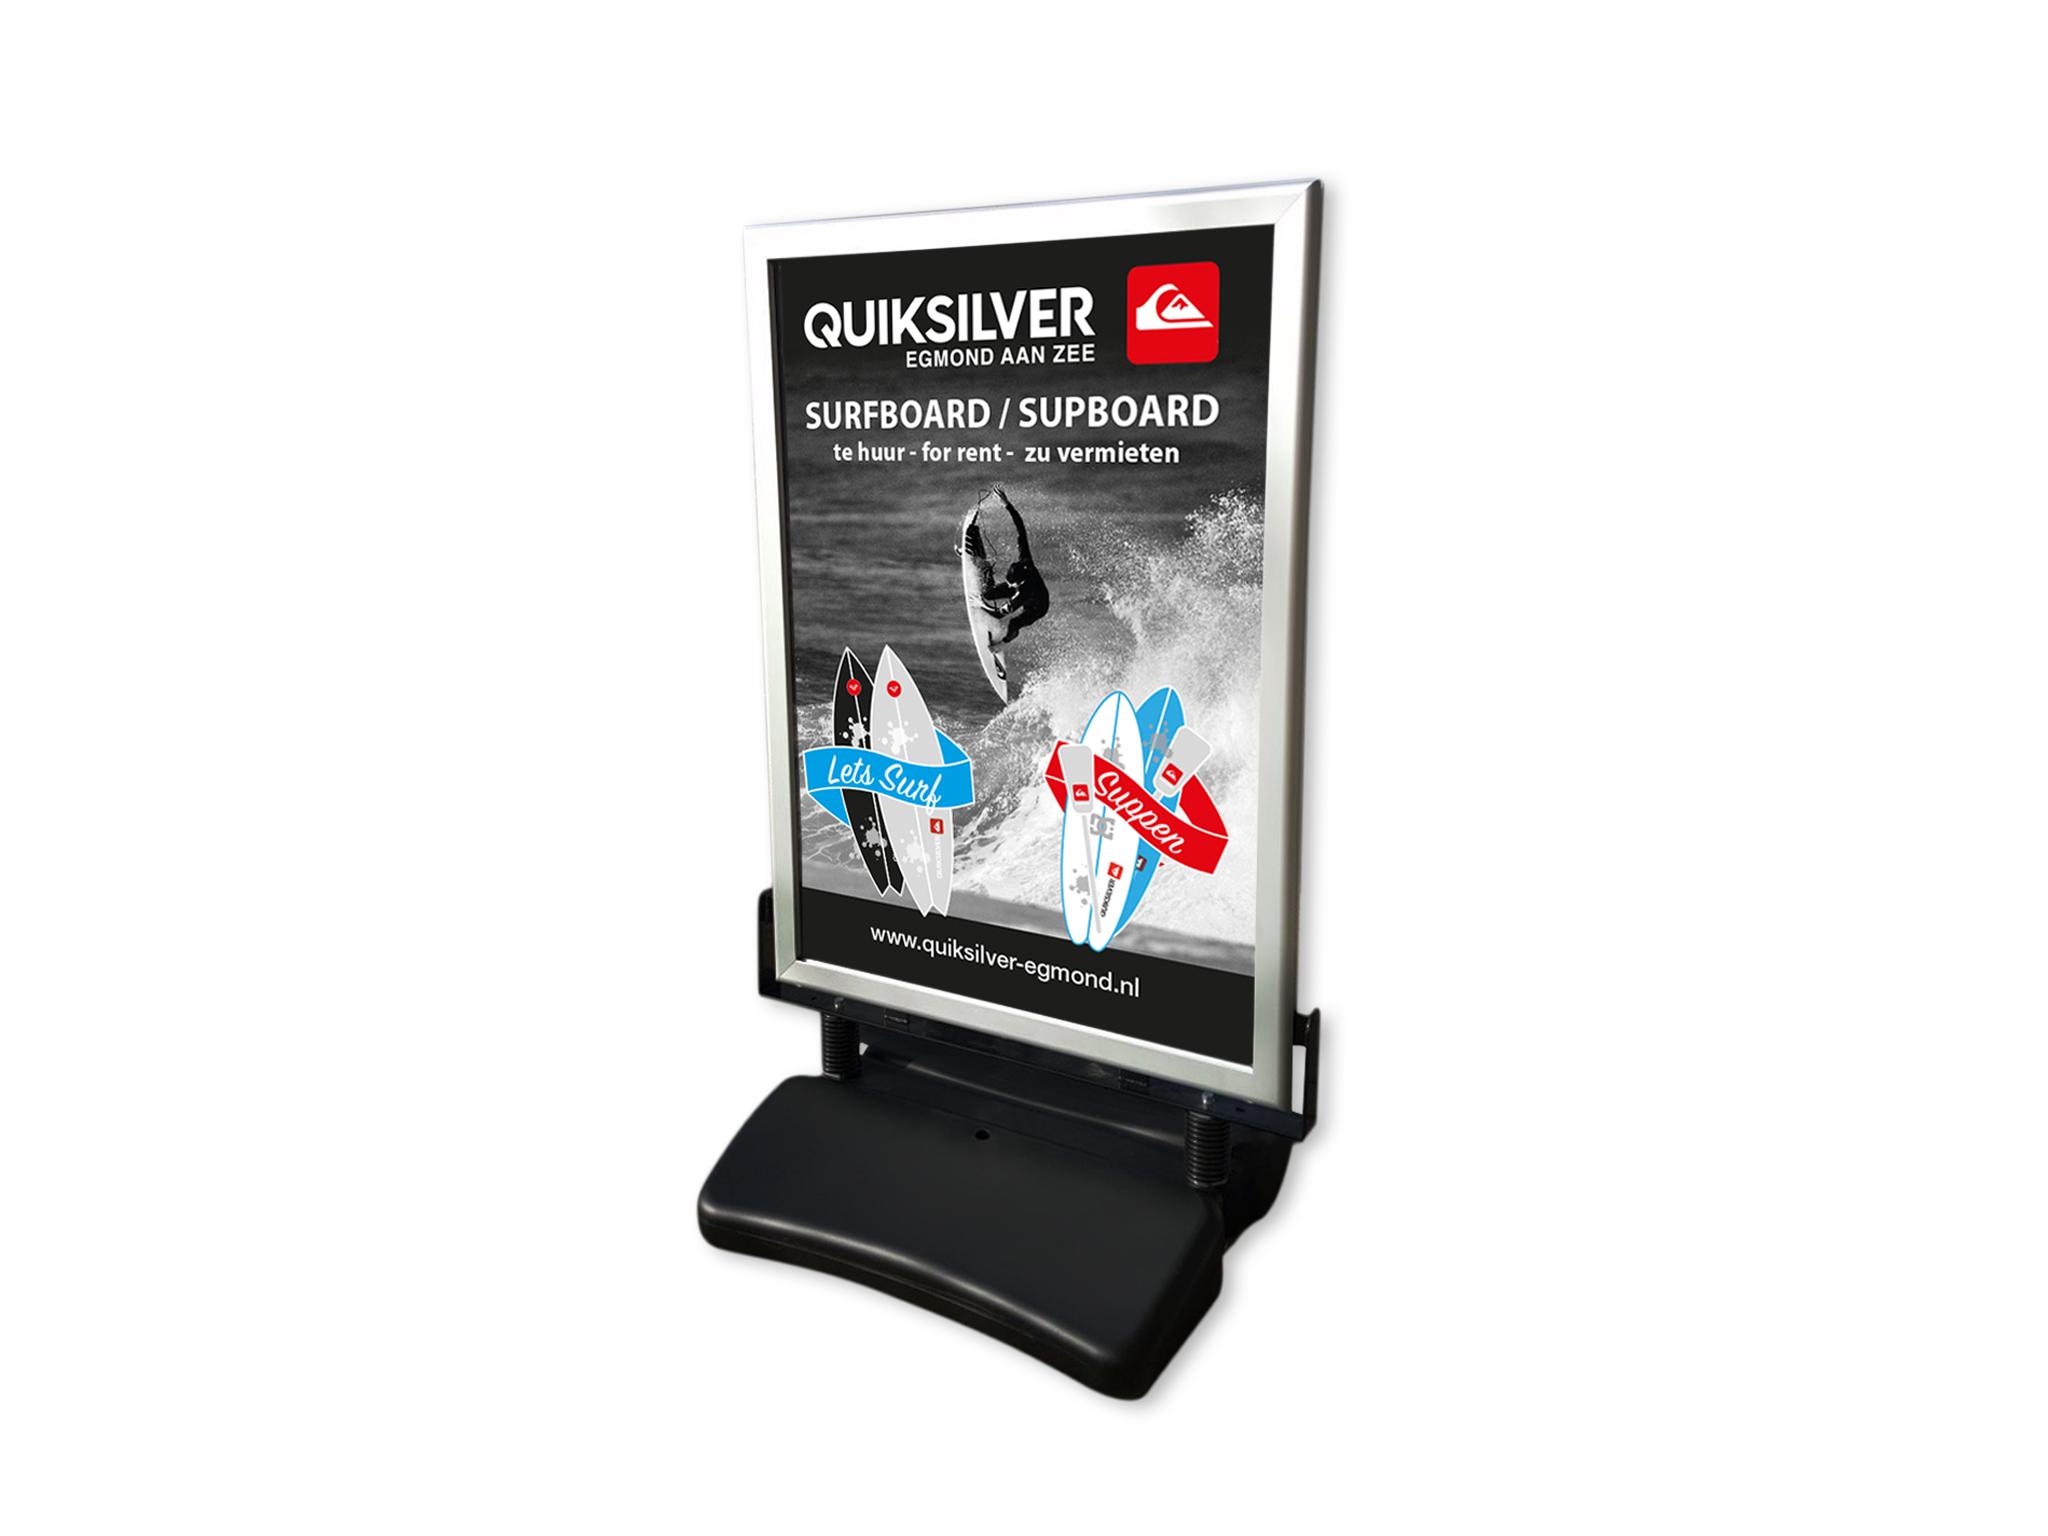 Quicksilver_Stoepbord_2